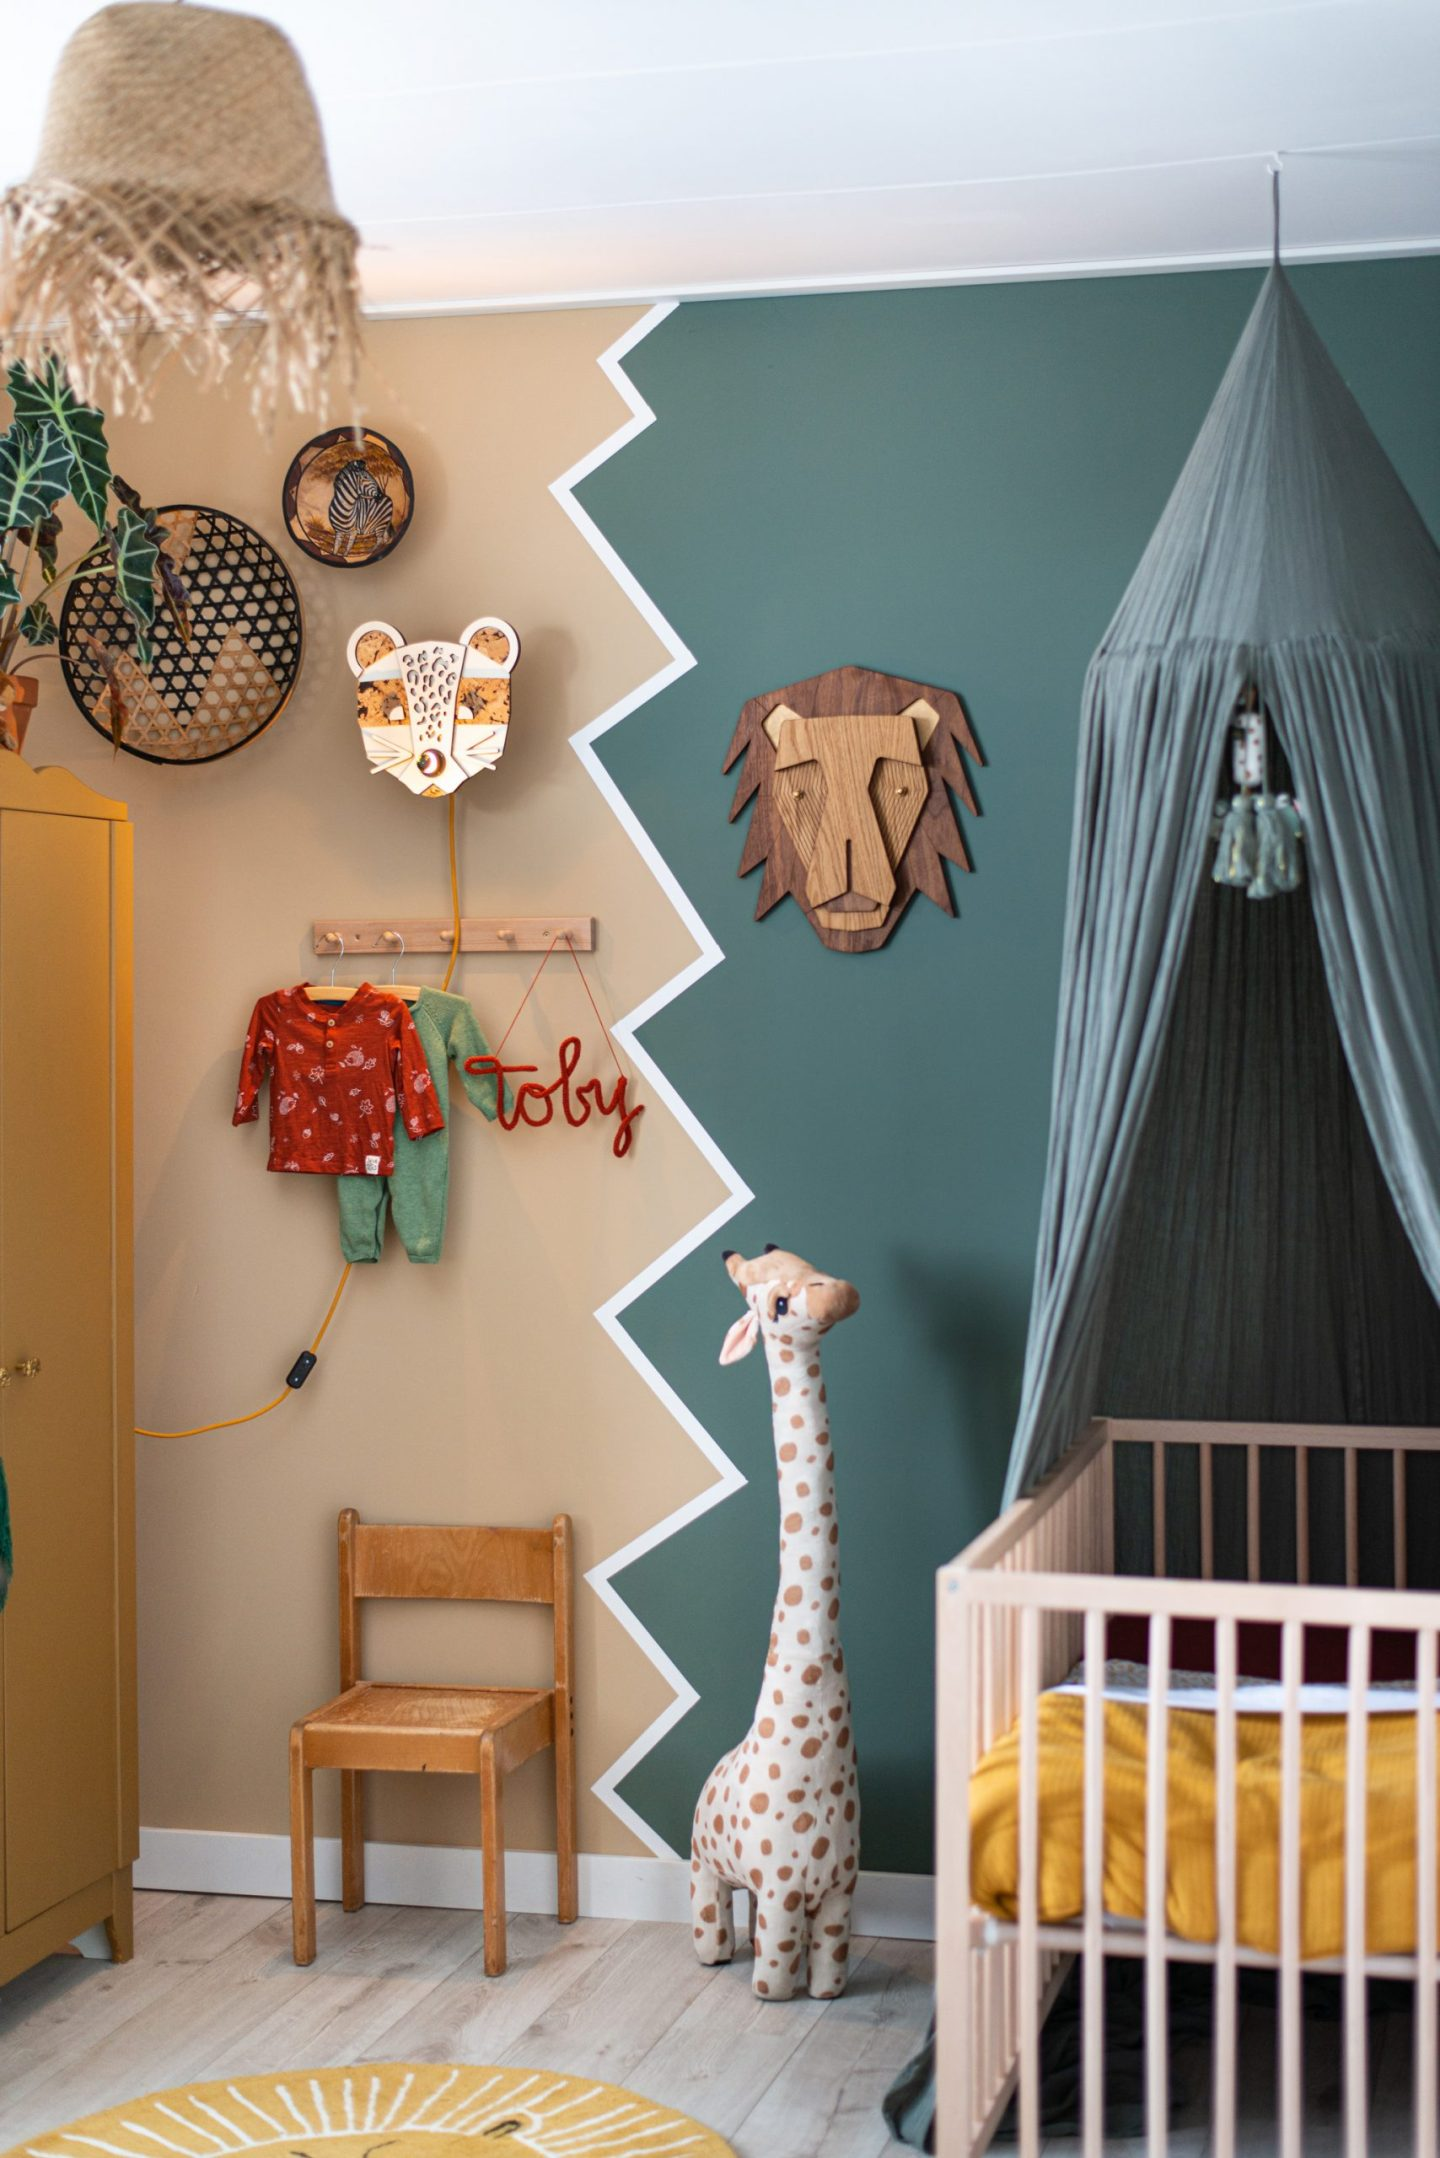 keeelly91blog nachtlampje made by the woods interieur babykamer kinderkamer nursery room bohemian interior styling kids room